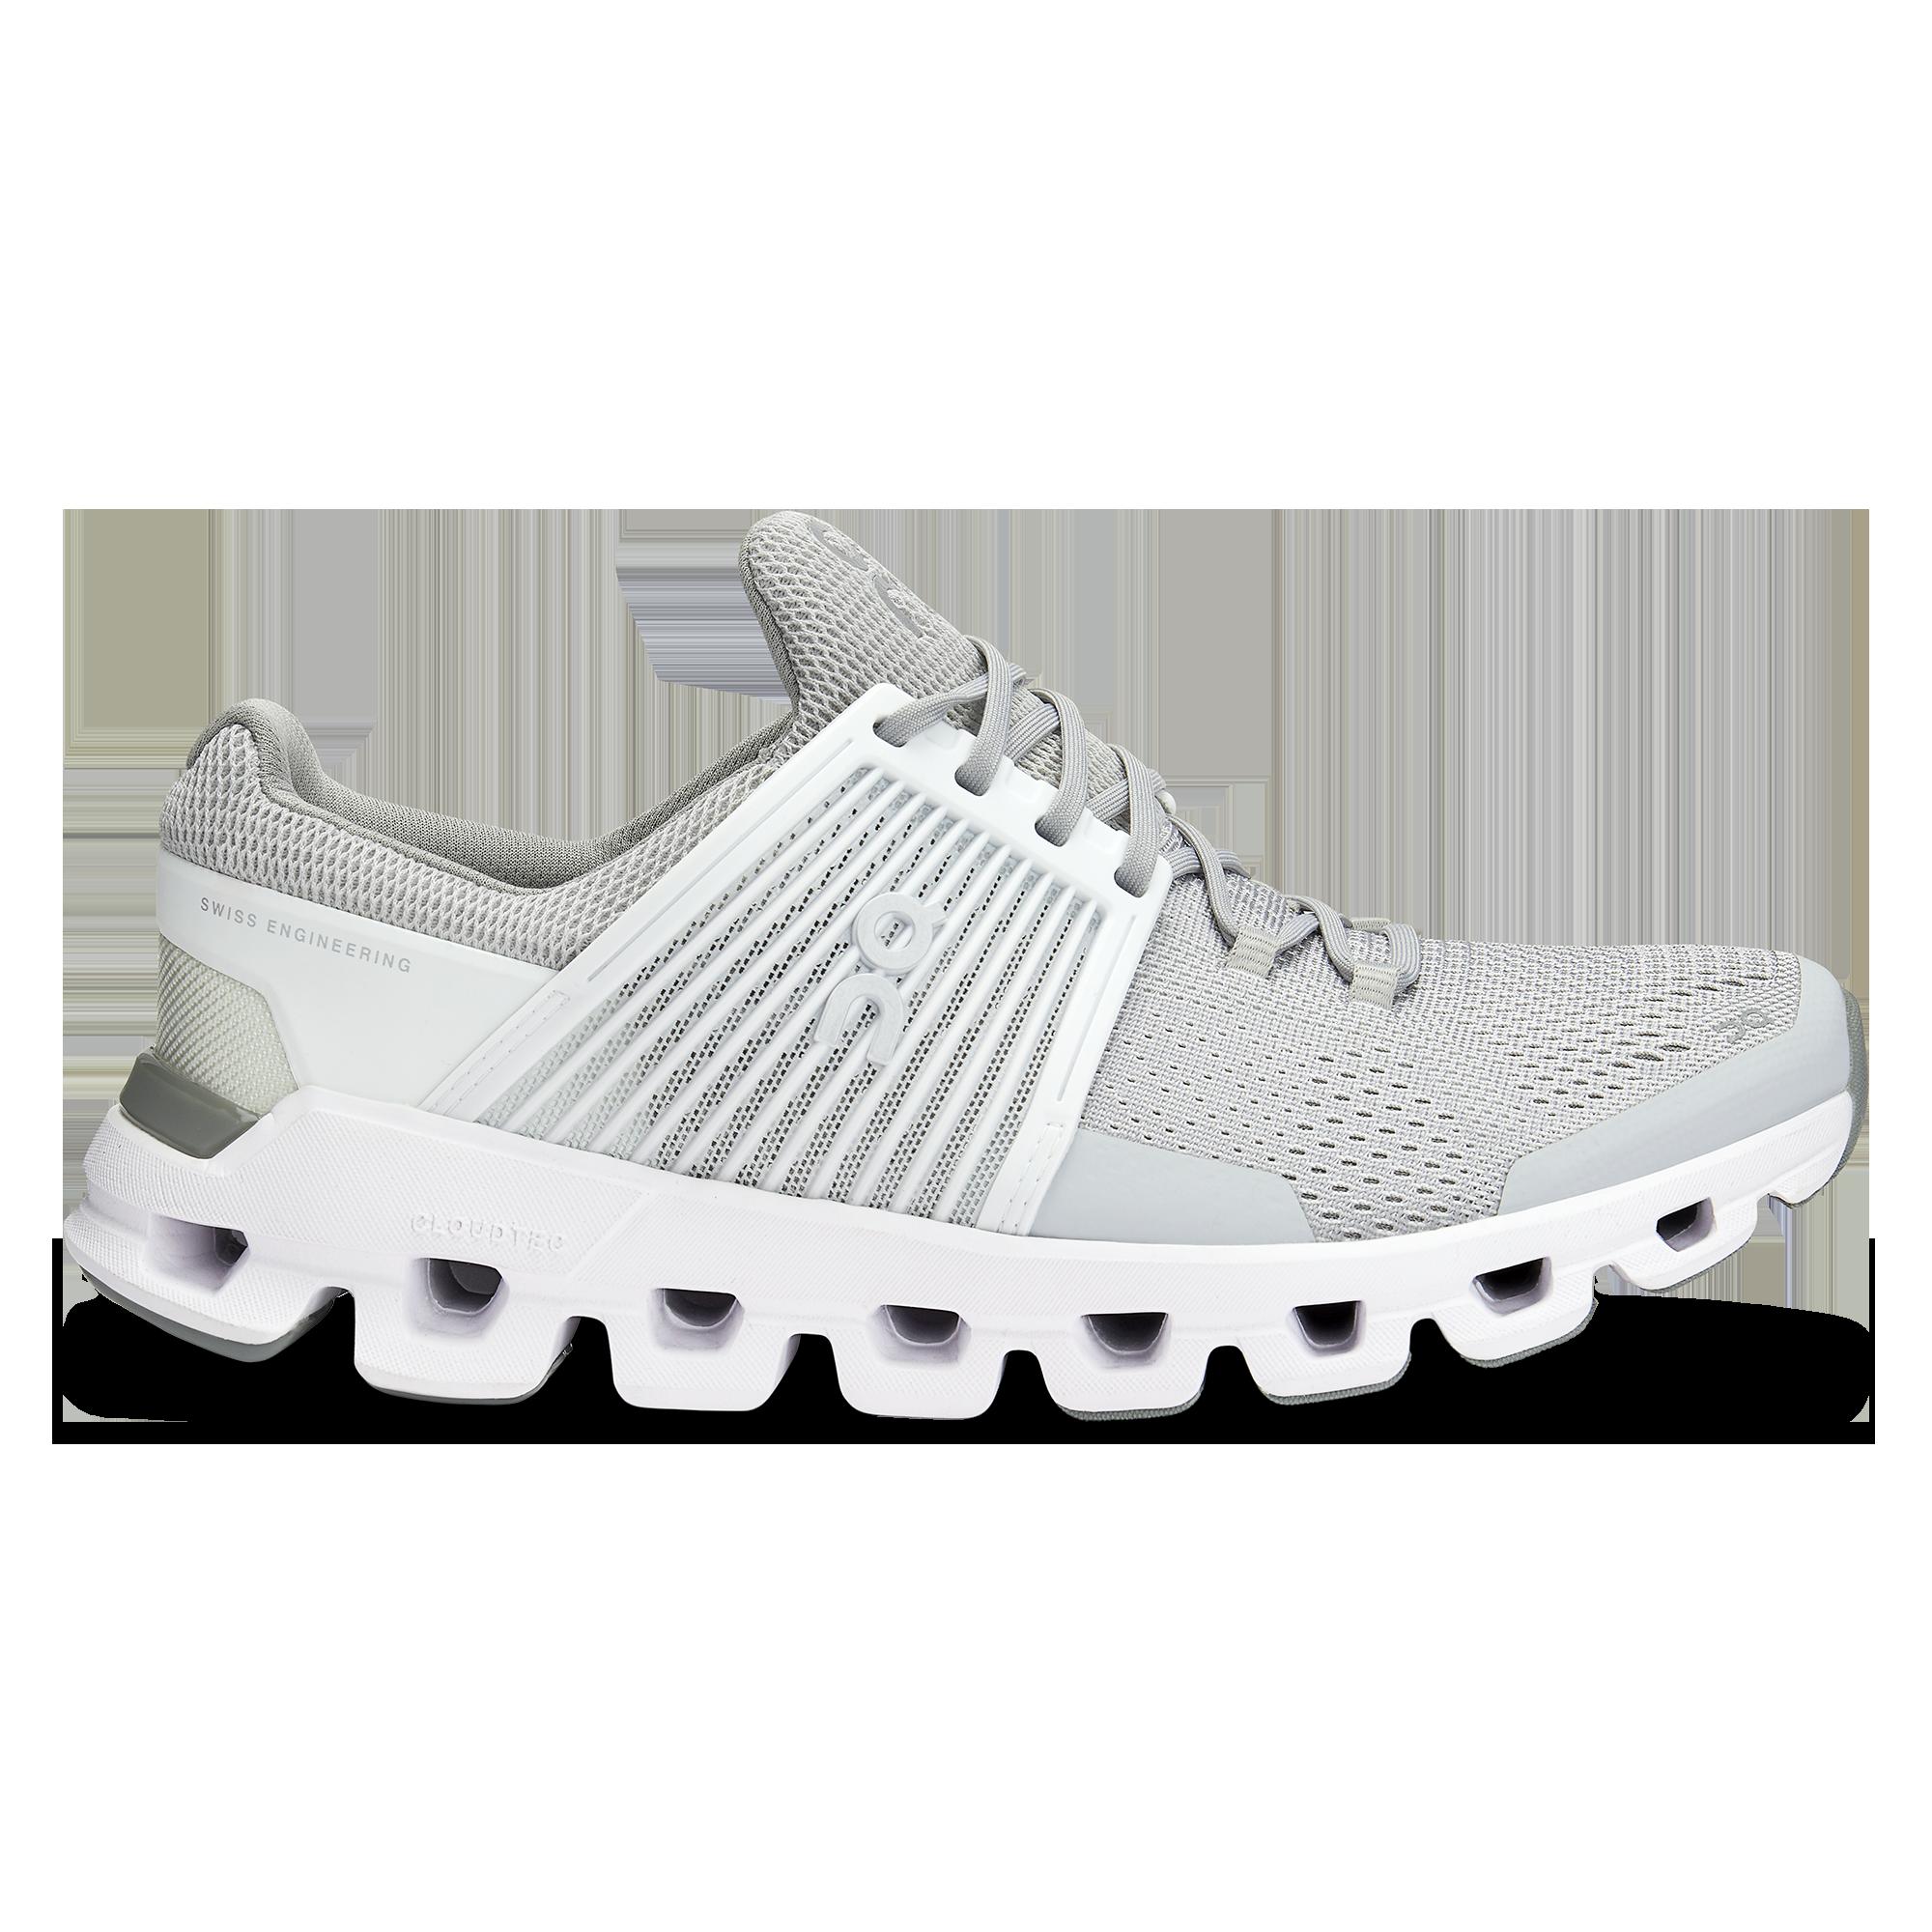 Road Shoe For Urban Running